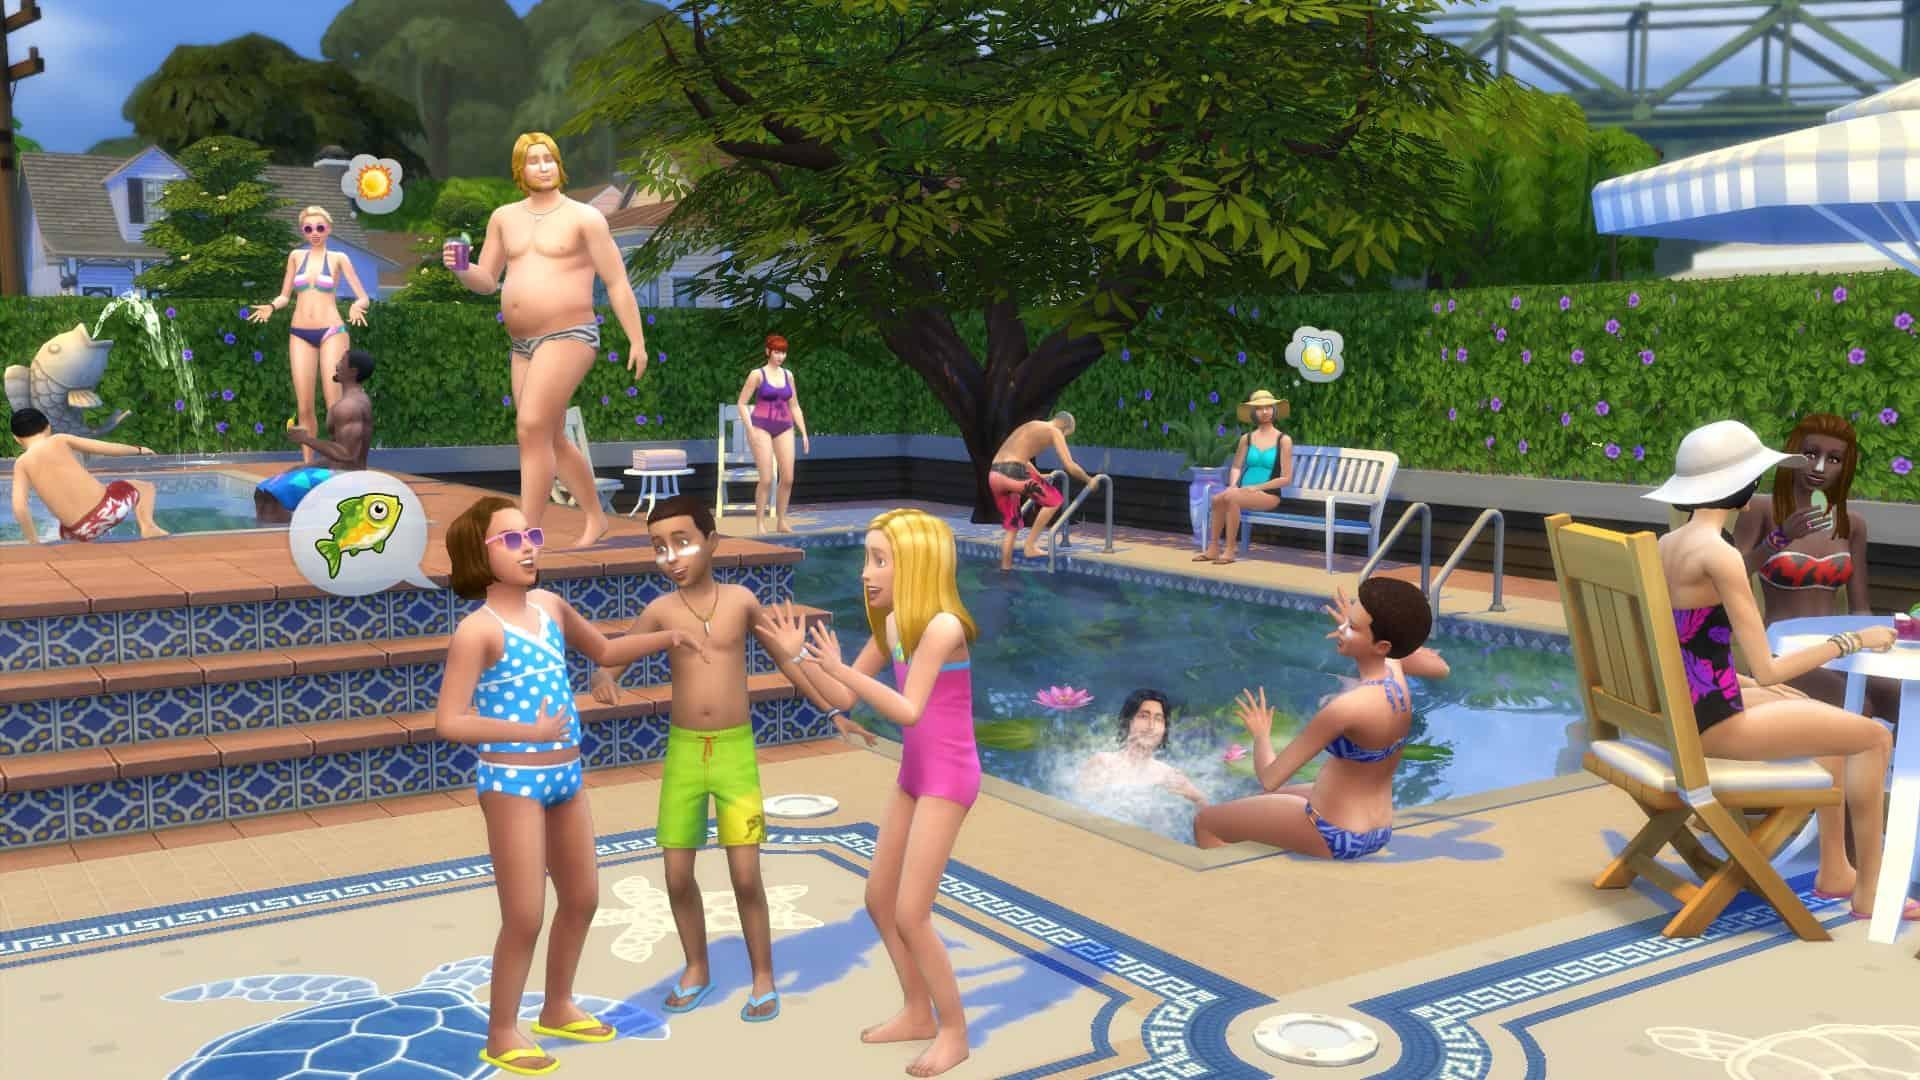 The sims 4 arrivano le piscine gameback for Sims 4 piscine a debordement